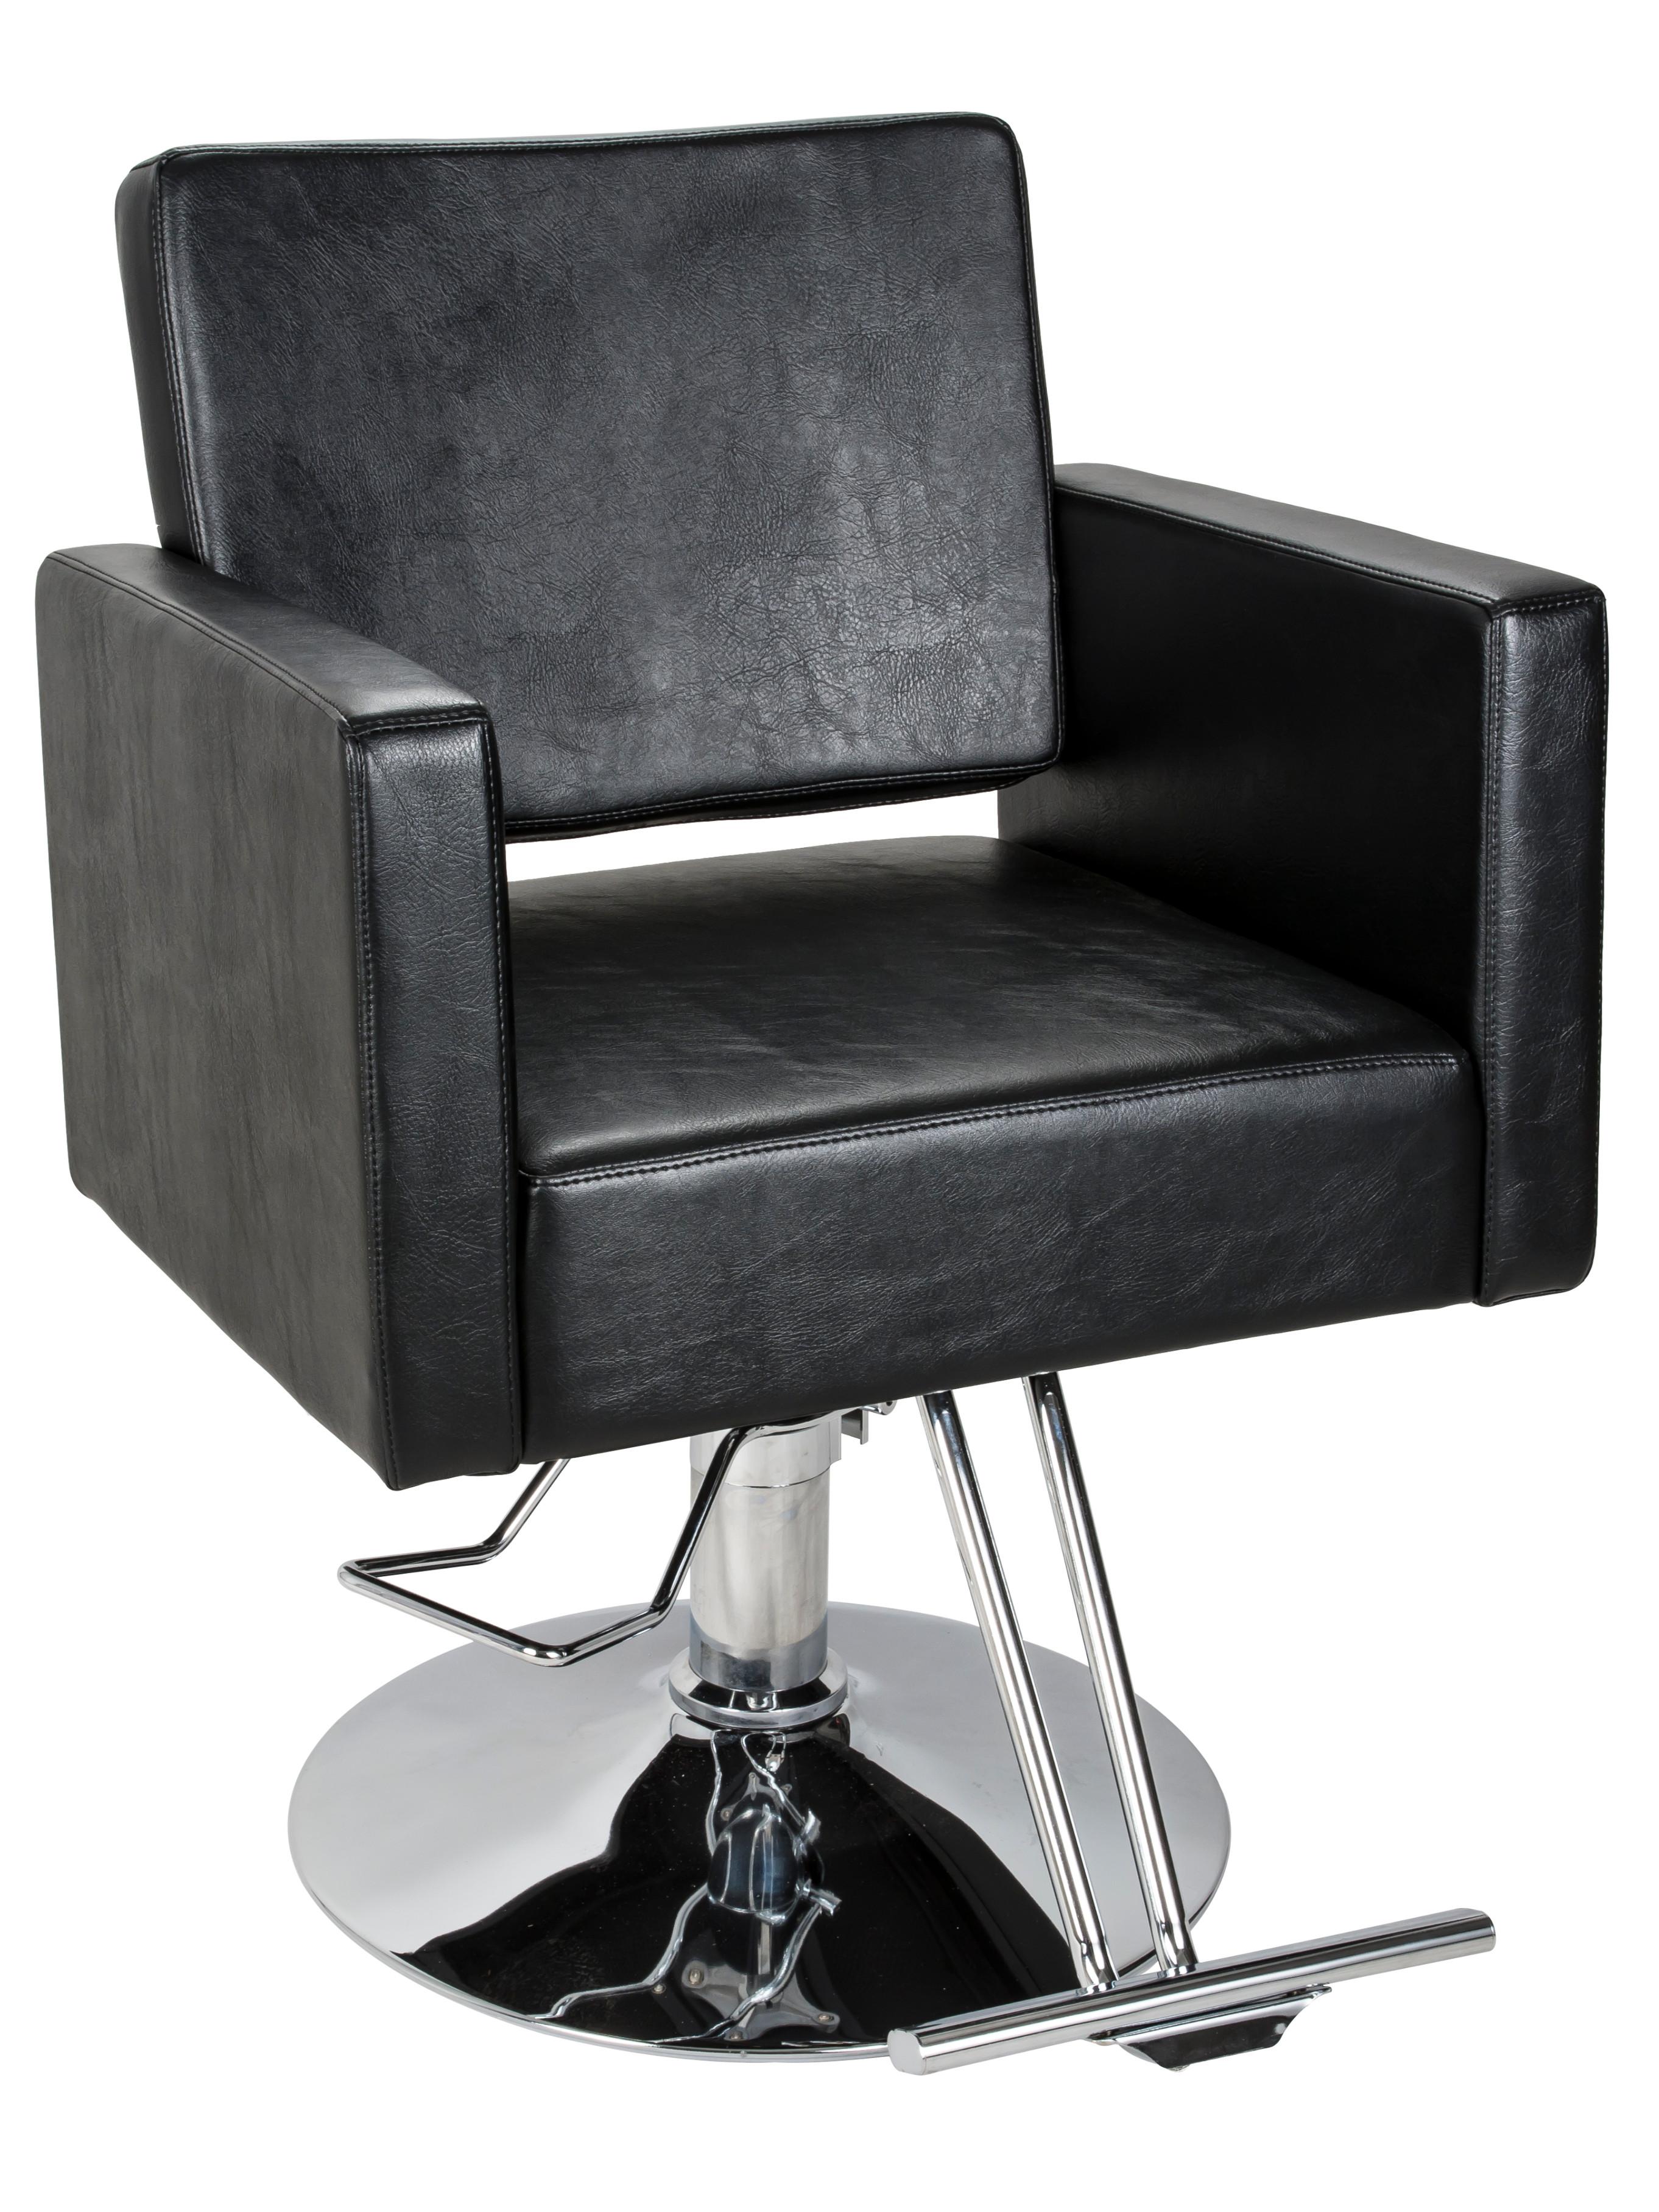 Kadeřnické křeslo SilverFox Y195, černé + DÁREK ZDARMA